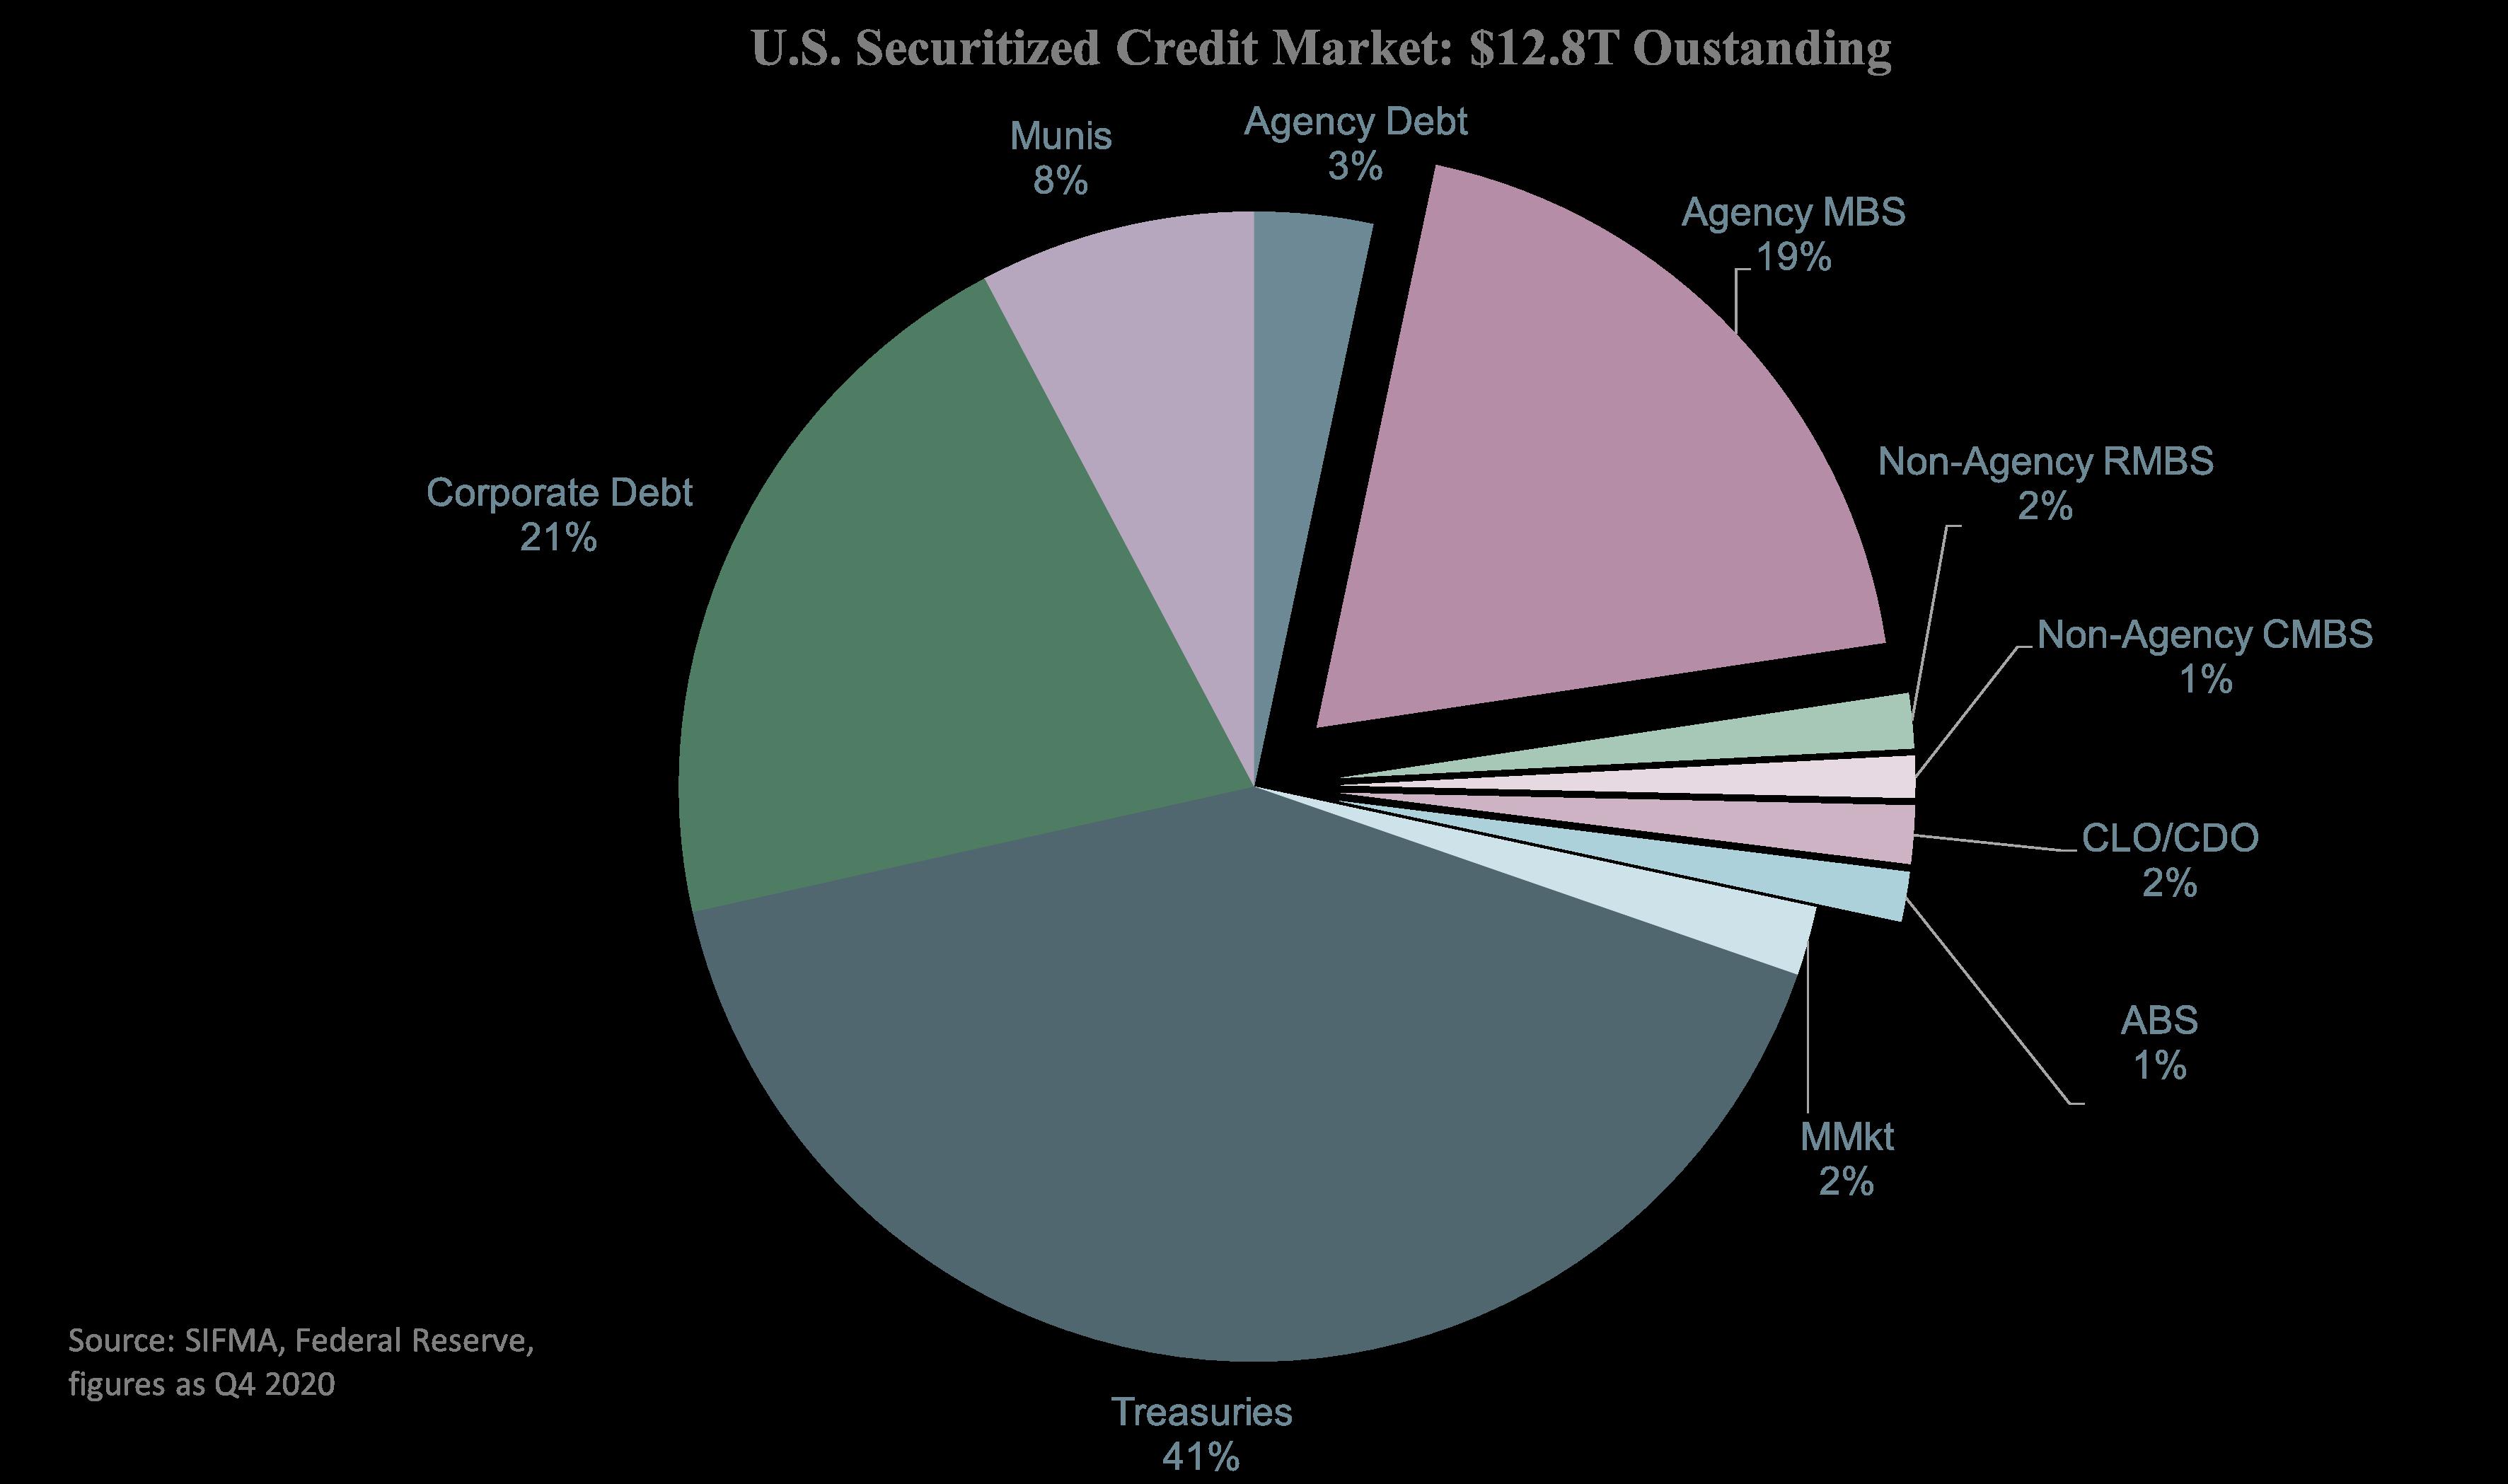 US Securitized Credit Market